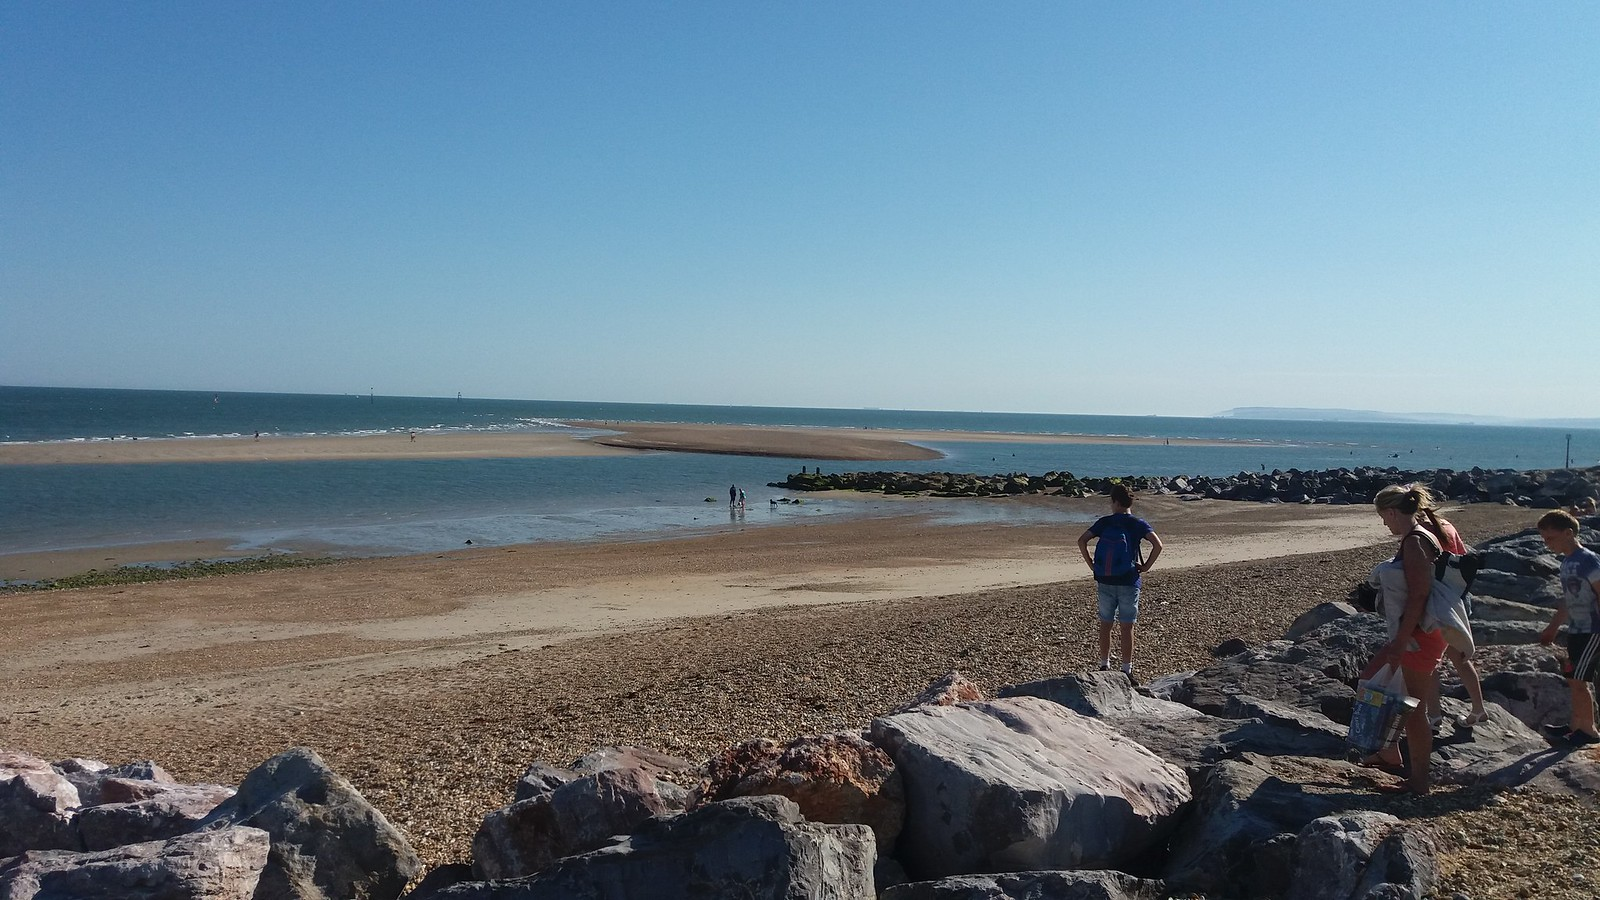 20160719_171932 Eastoke Point sandbar